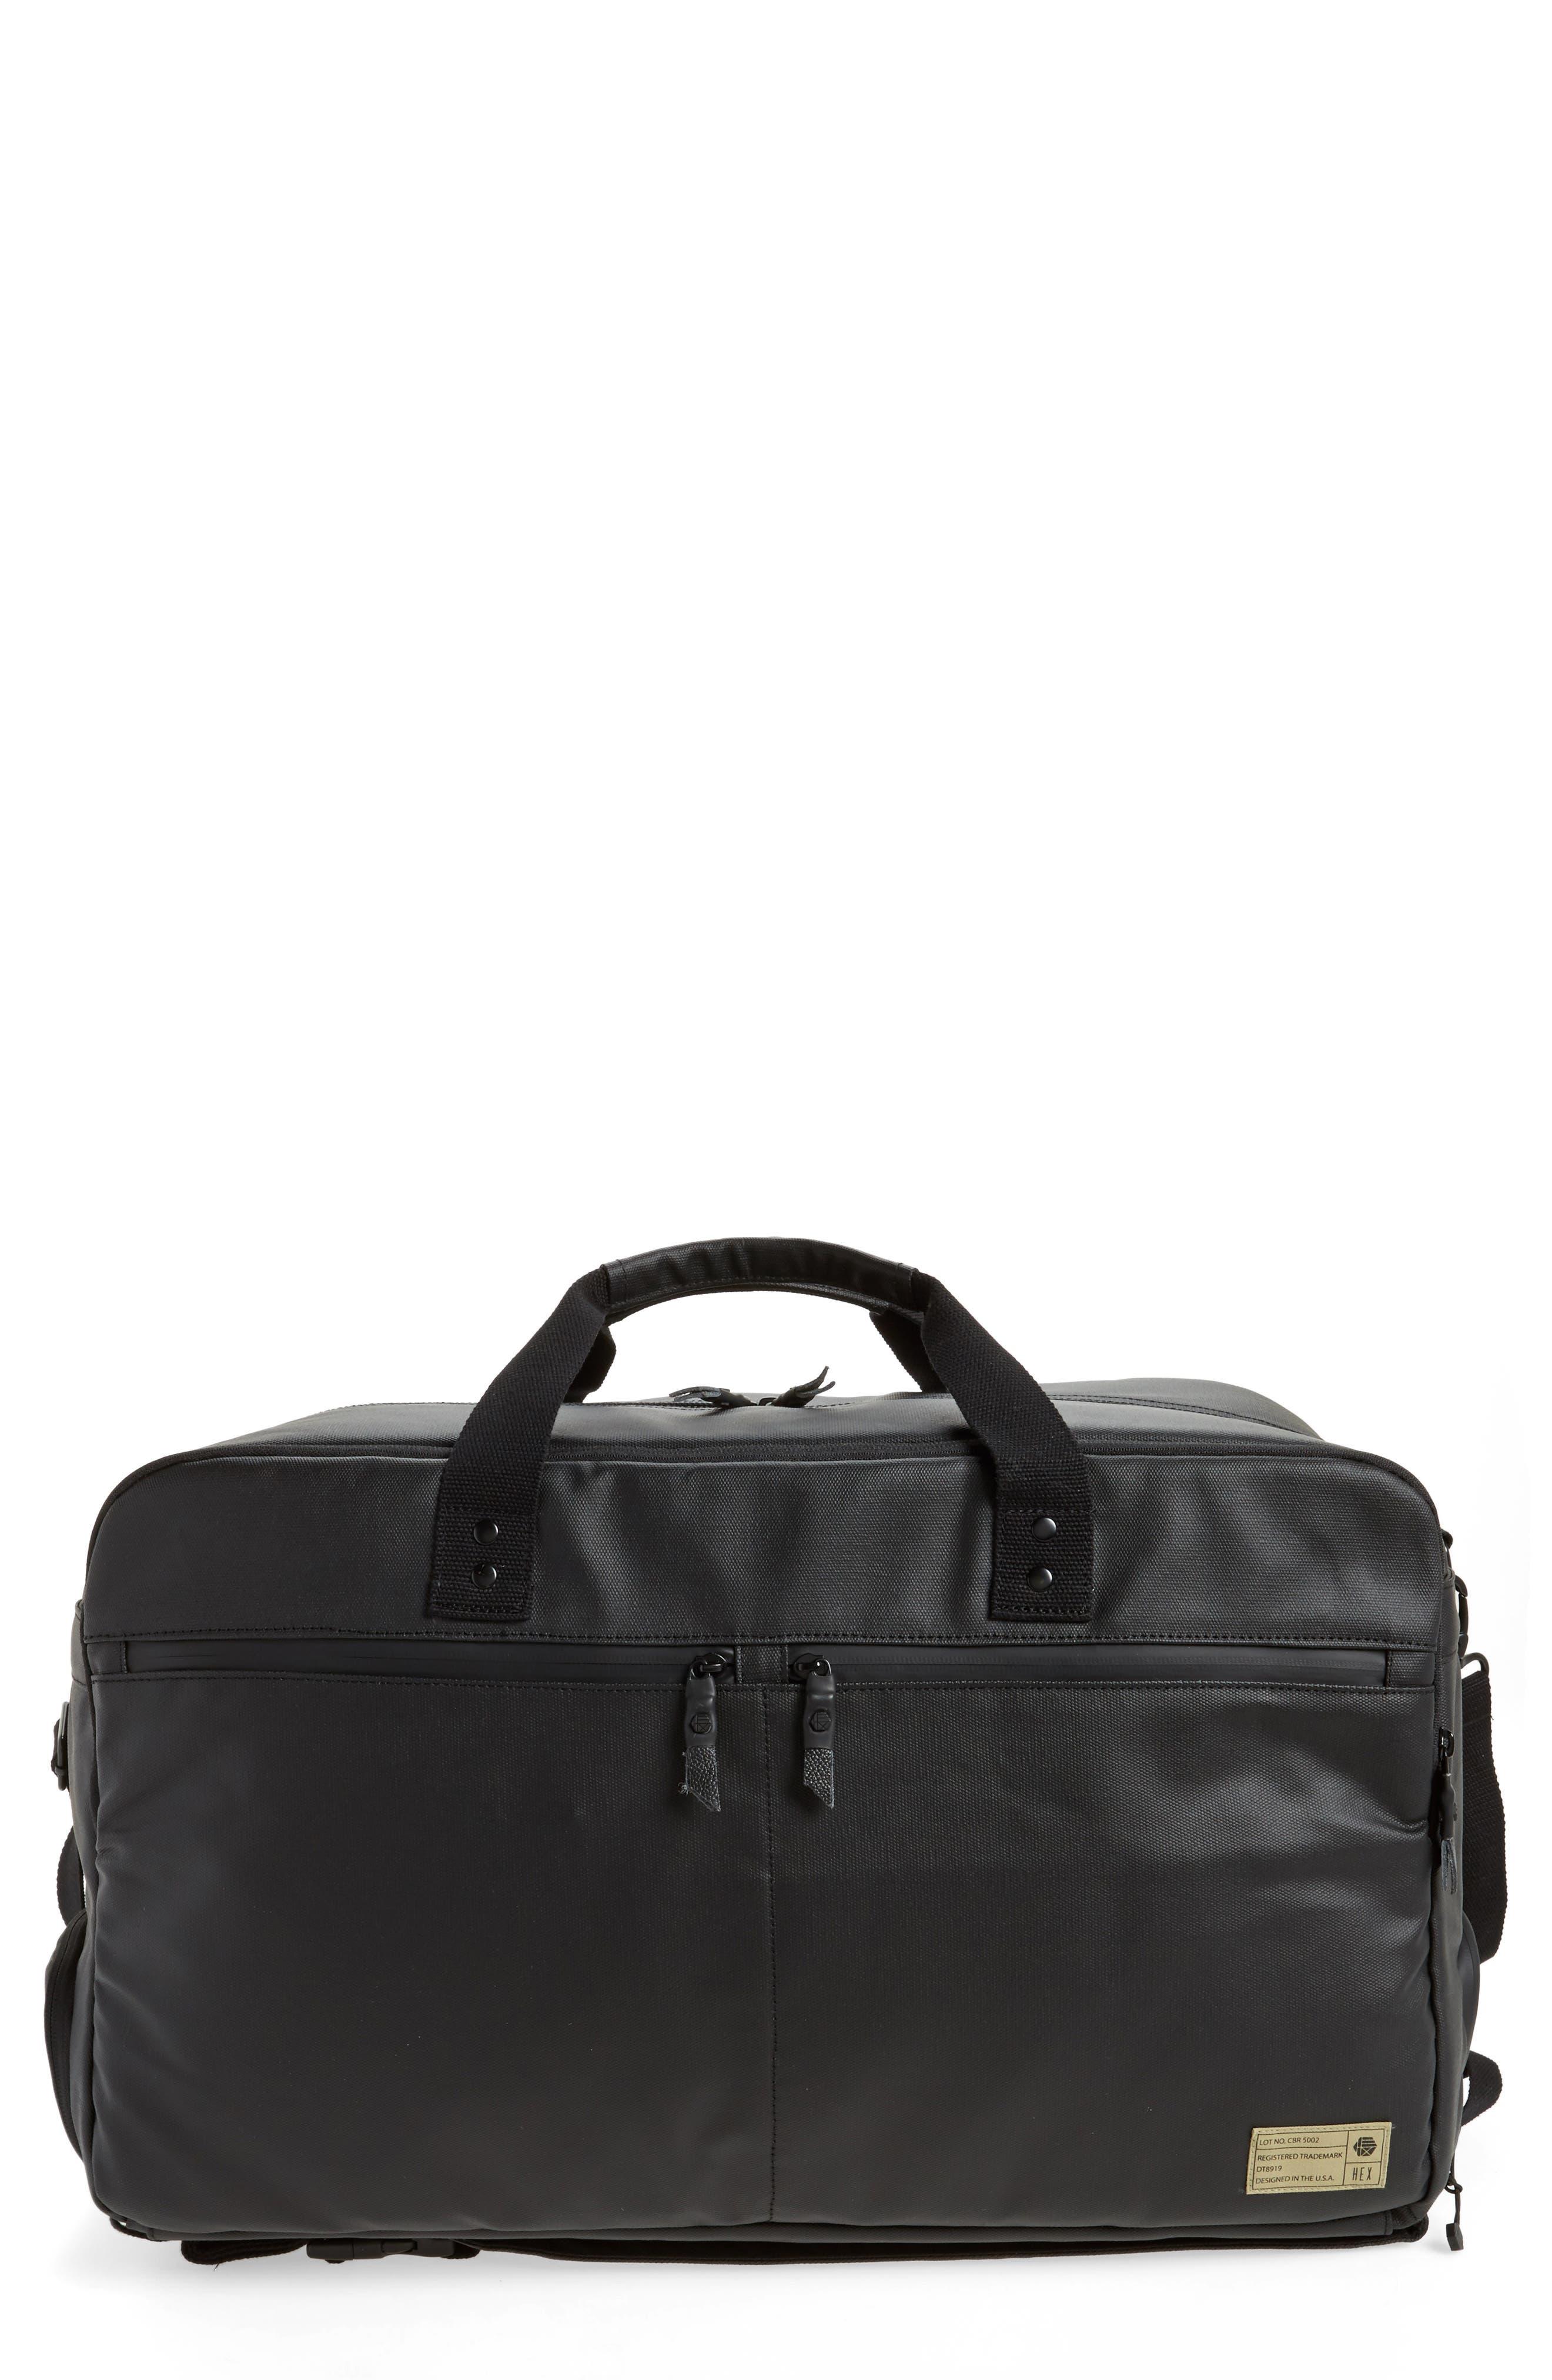 Convertible Duffel Bag,                             Main thumbnail 1, color,                             001